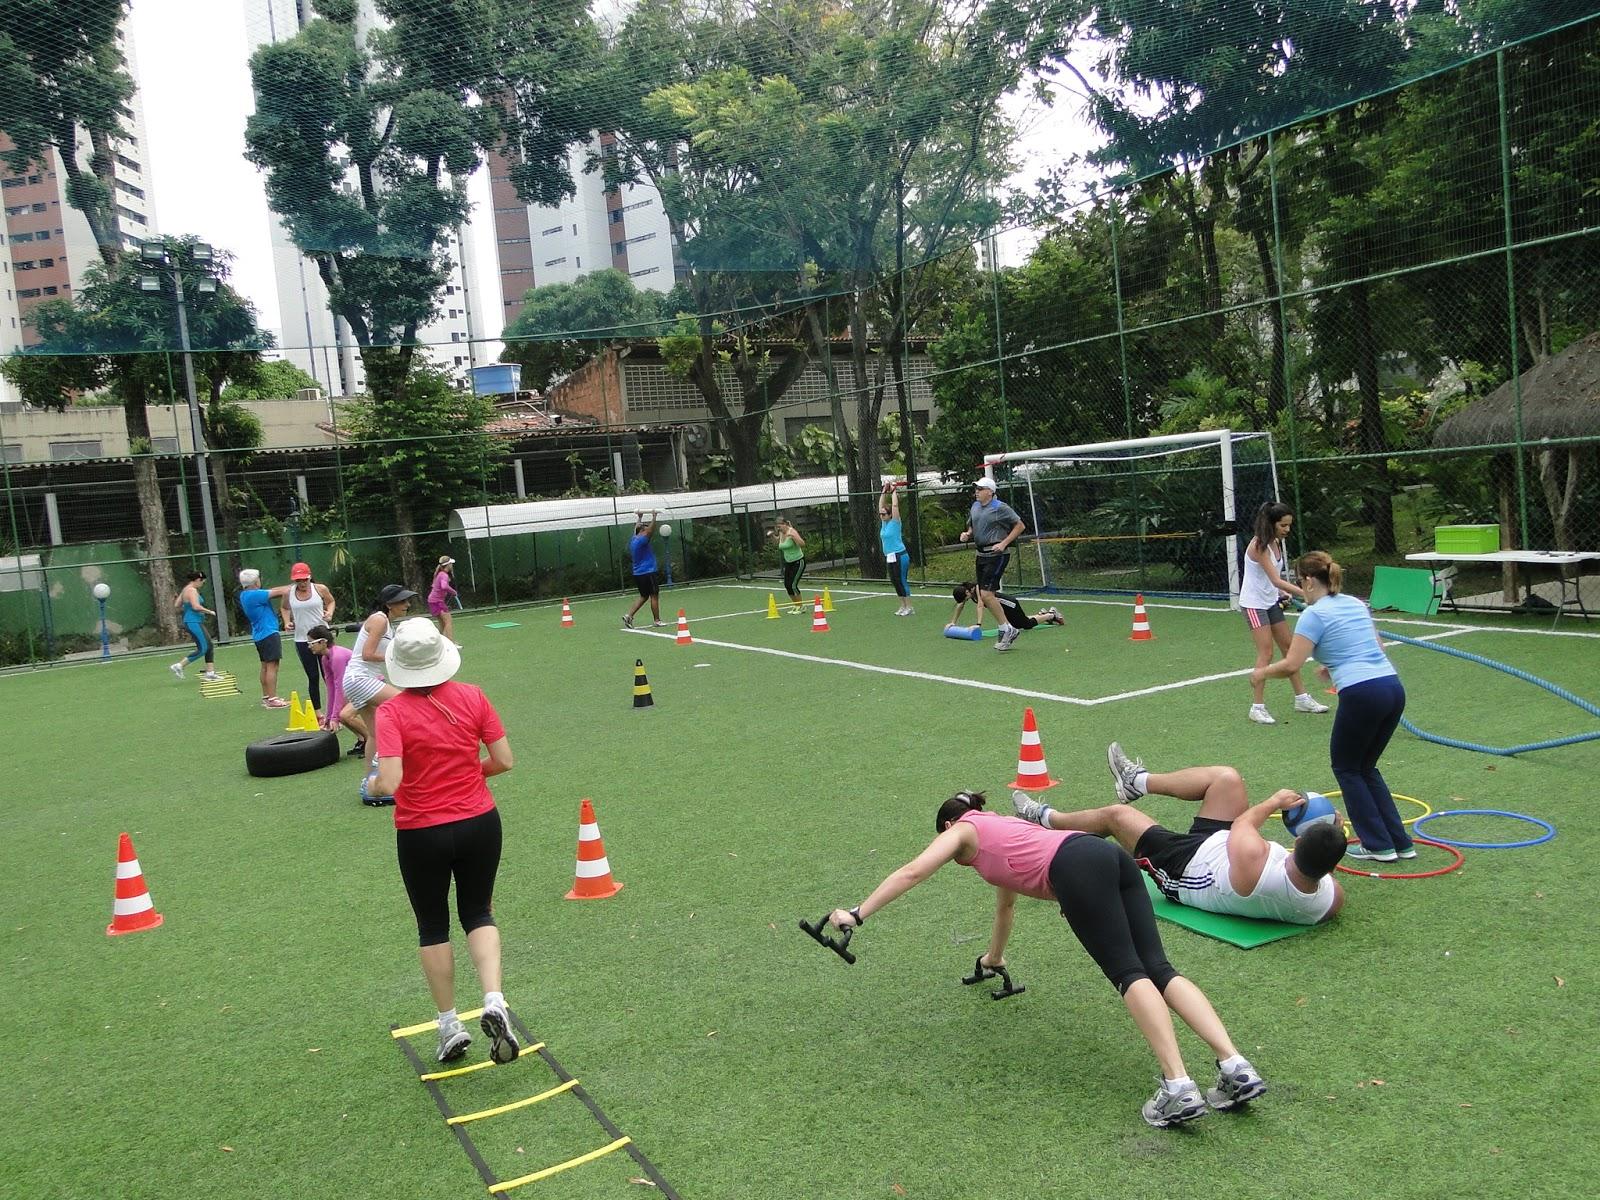 Circuito Funcional : Running assessoria esportiva circuito funcional country club